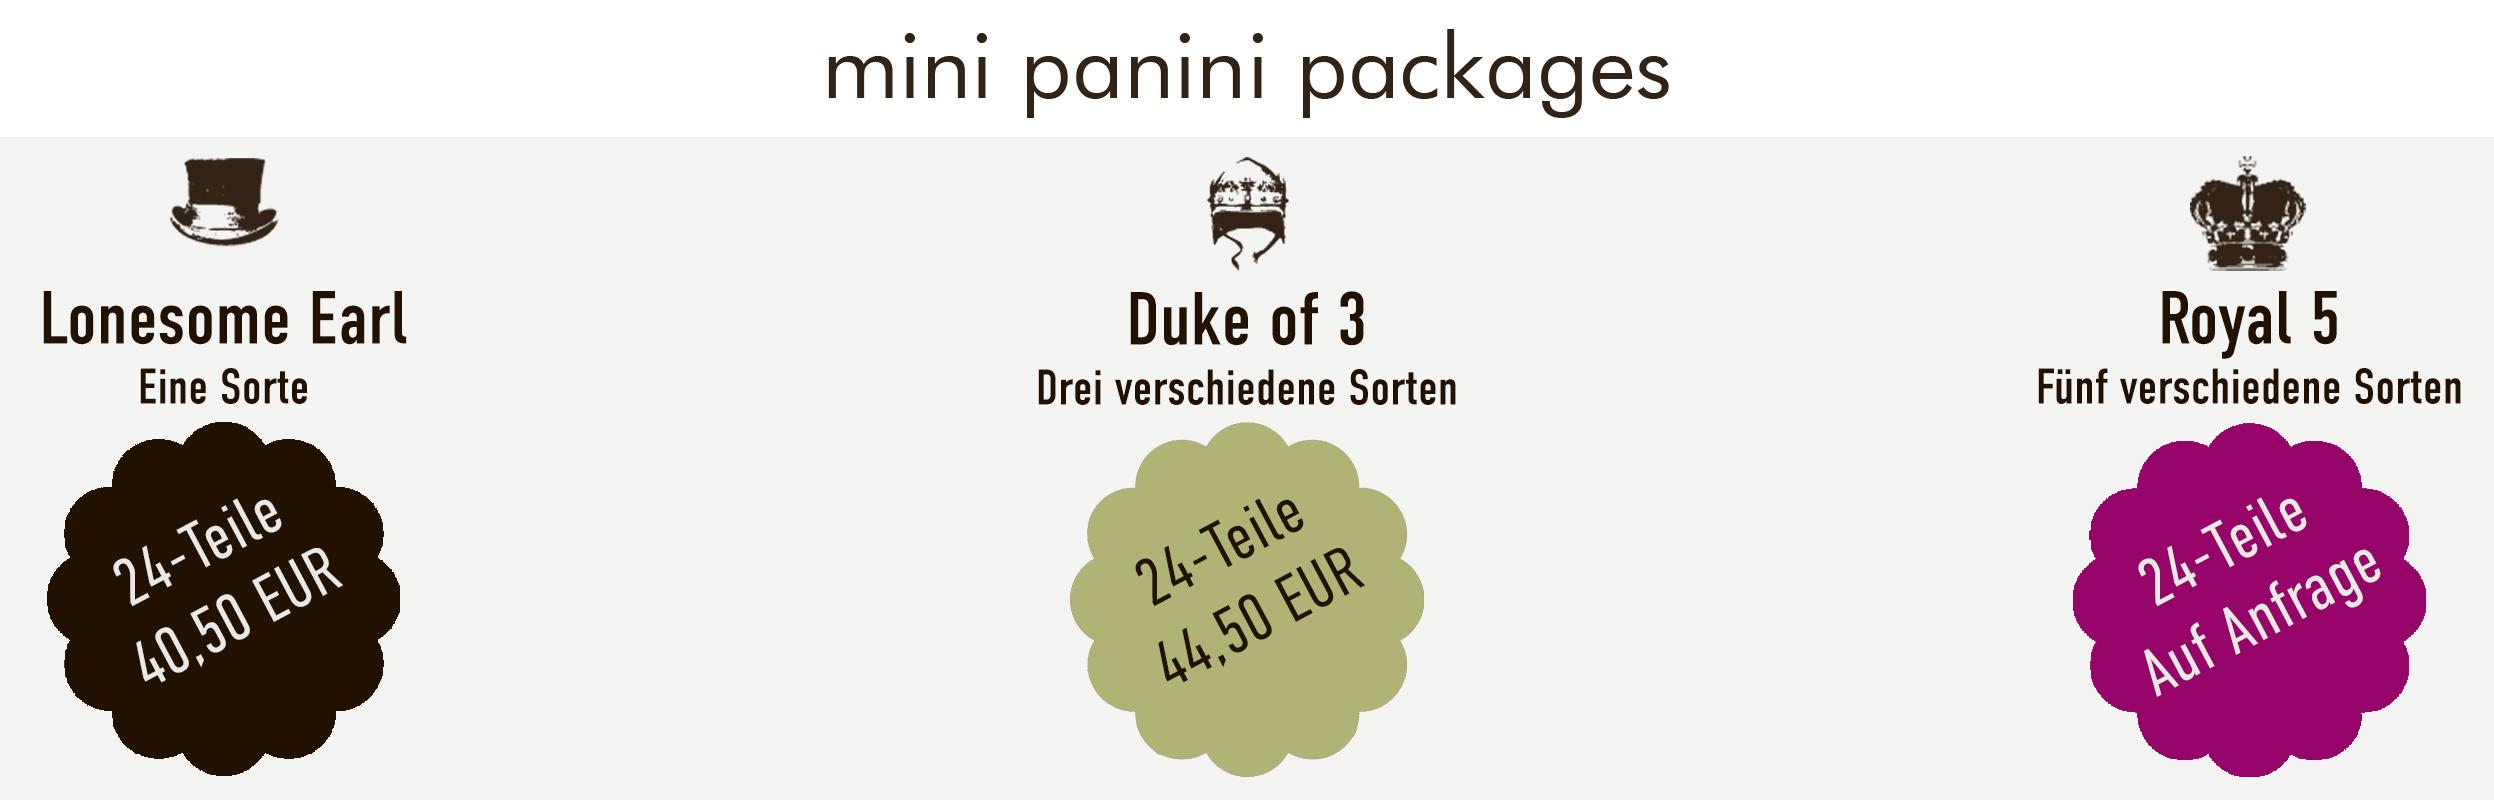 Mini Panini Packages